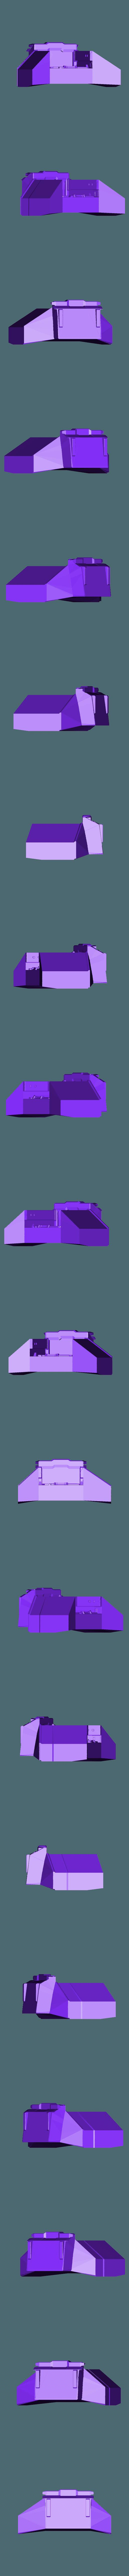 Eagle_Back_Door.stl Download free STL file Eagle Multi Colour/Material (Elite Dangerous) • 3D print object, Kahnindustries